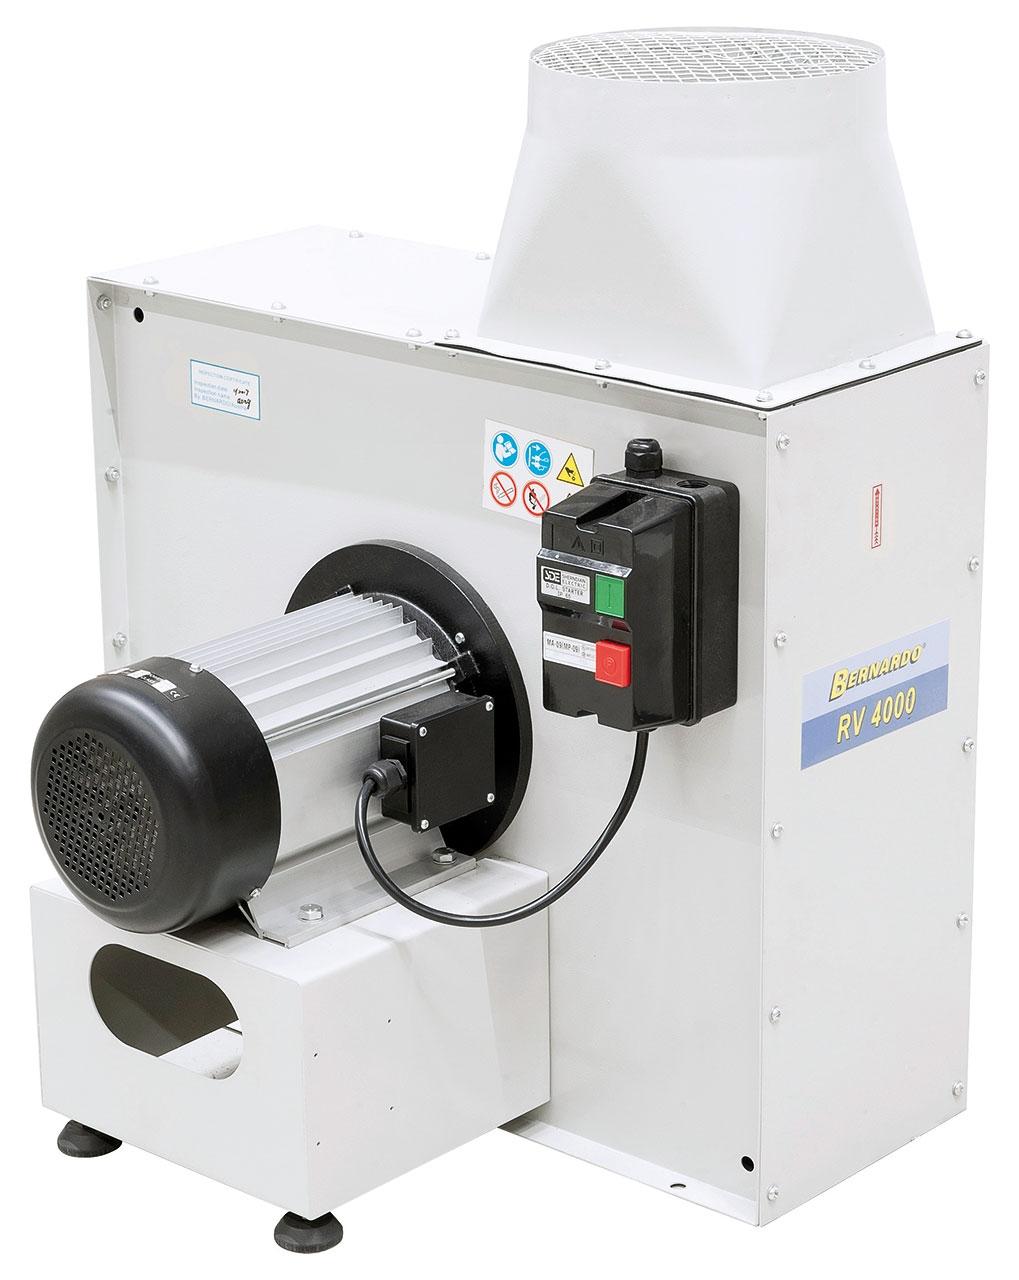 Wentylator promieniowy RV 4000 BERNARDO